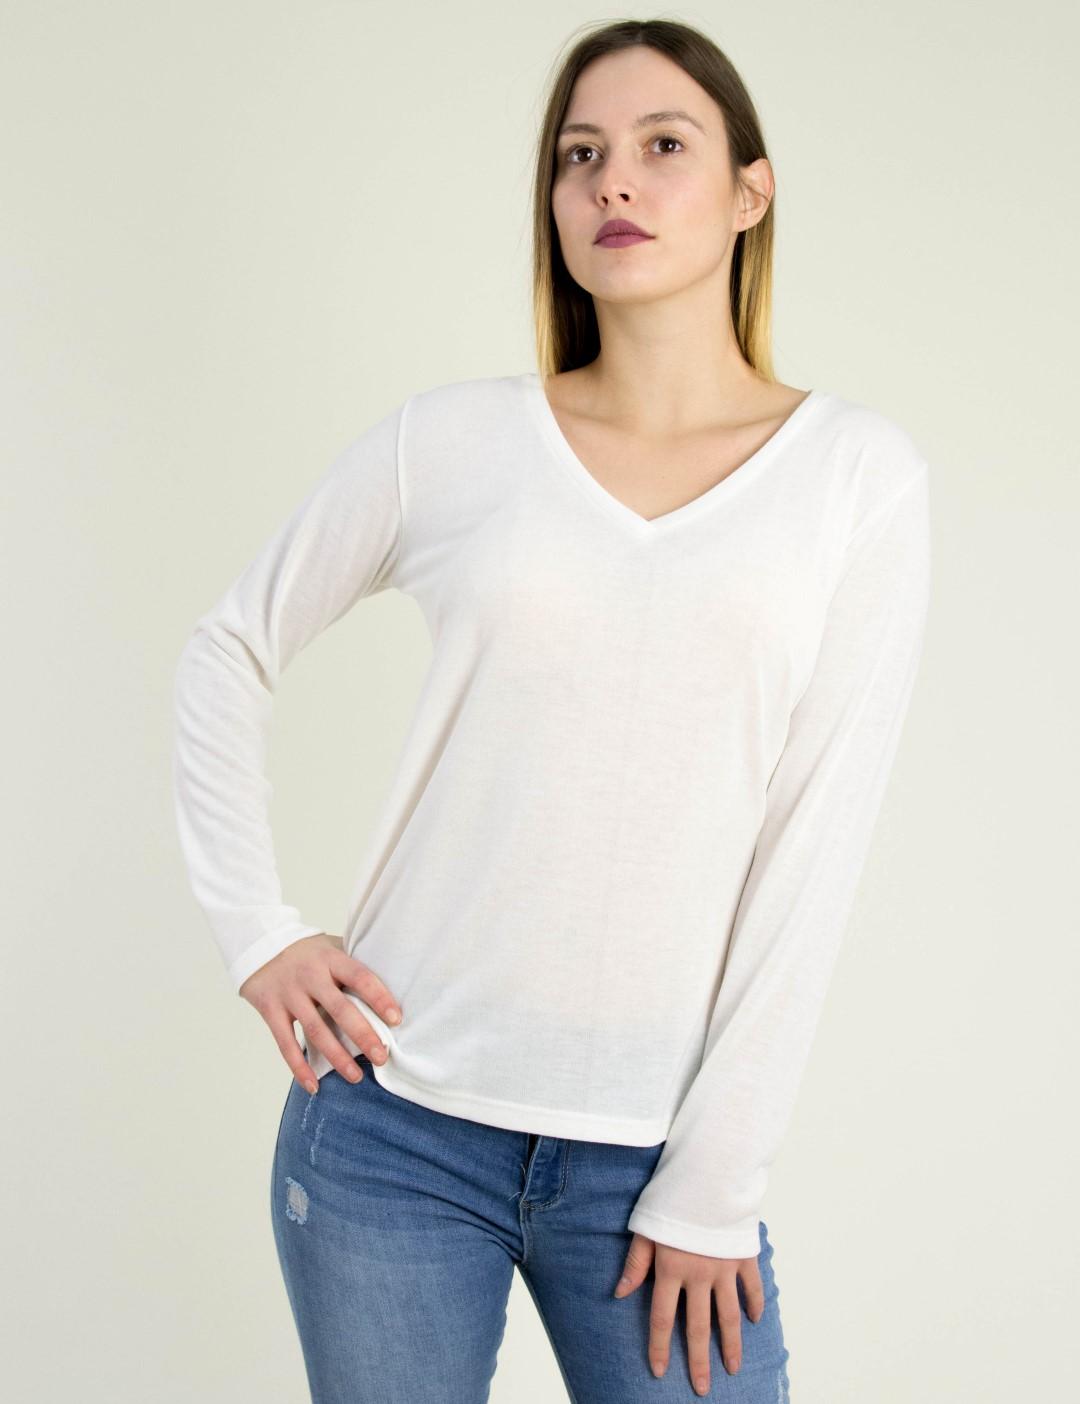 95021f0c6eae Γυναικείο γκρι βαμβακερό tshirt με patch 1176110L. Marlen - 12.90 €. Γυναικείο  γκρι · Γυναικεία λευκή μακρυμάνικη μπλουζα Ve 1175769W